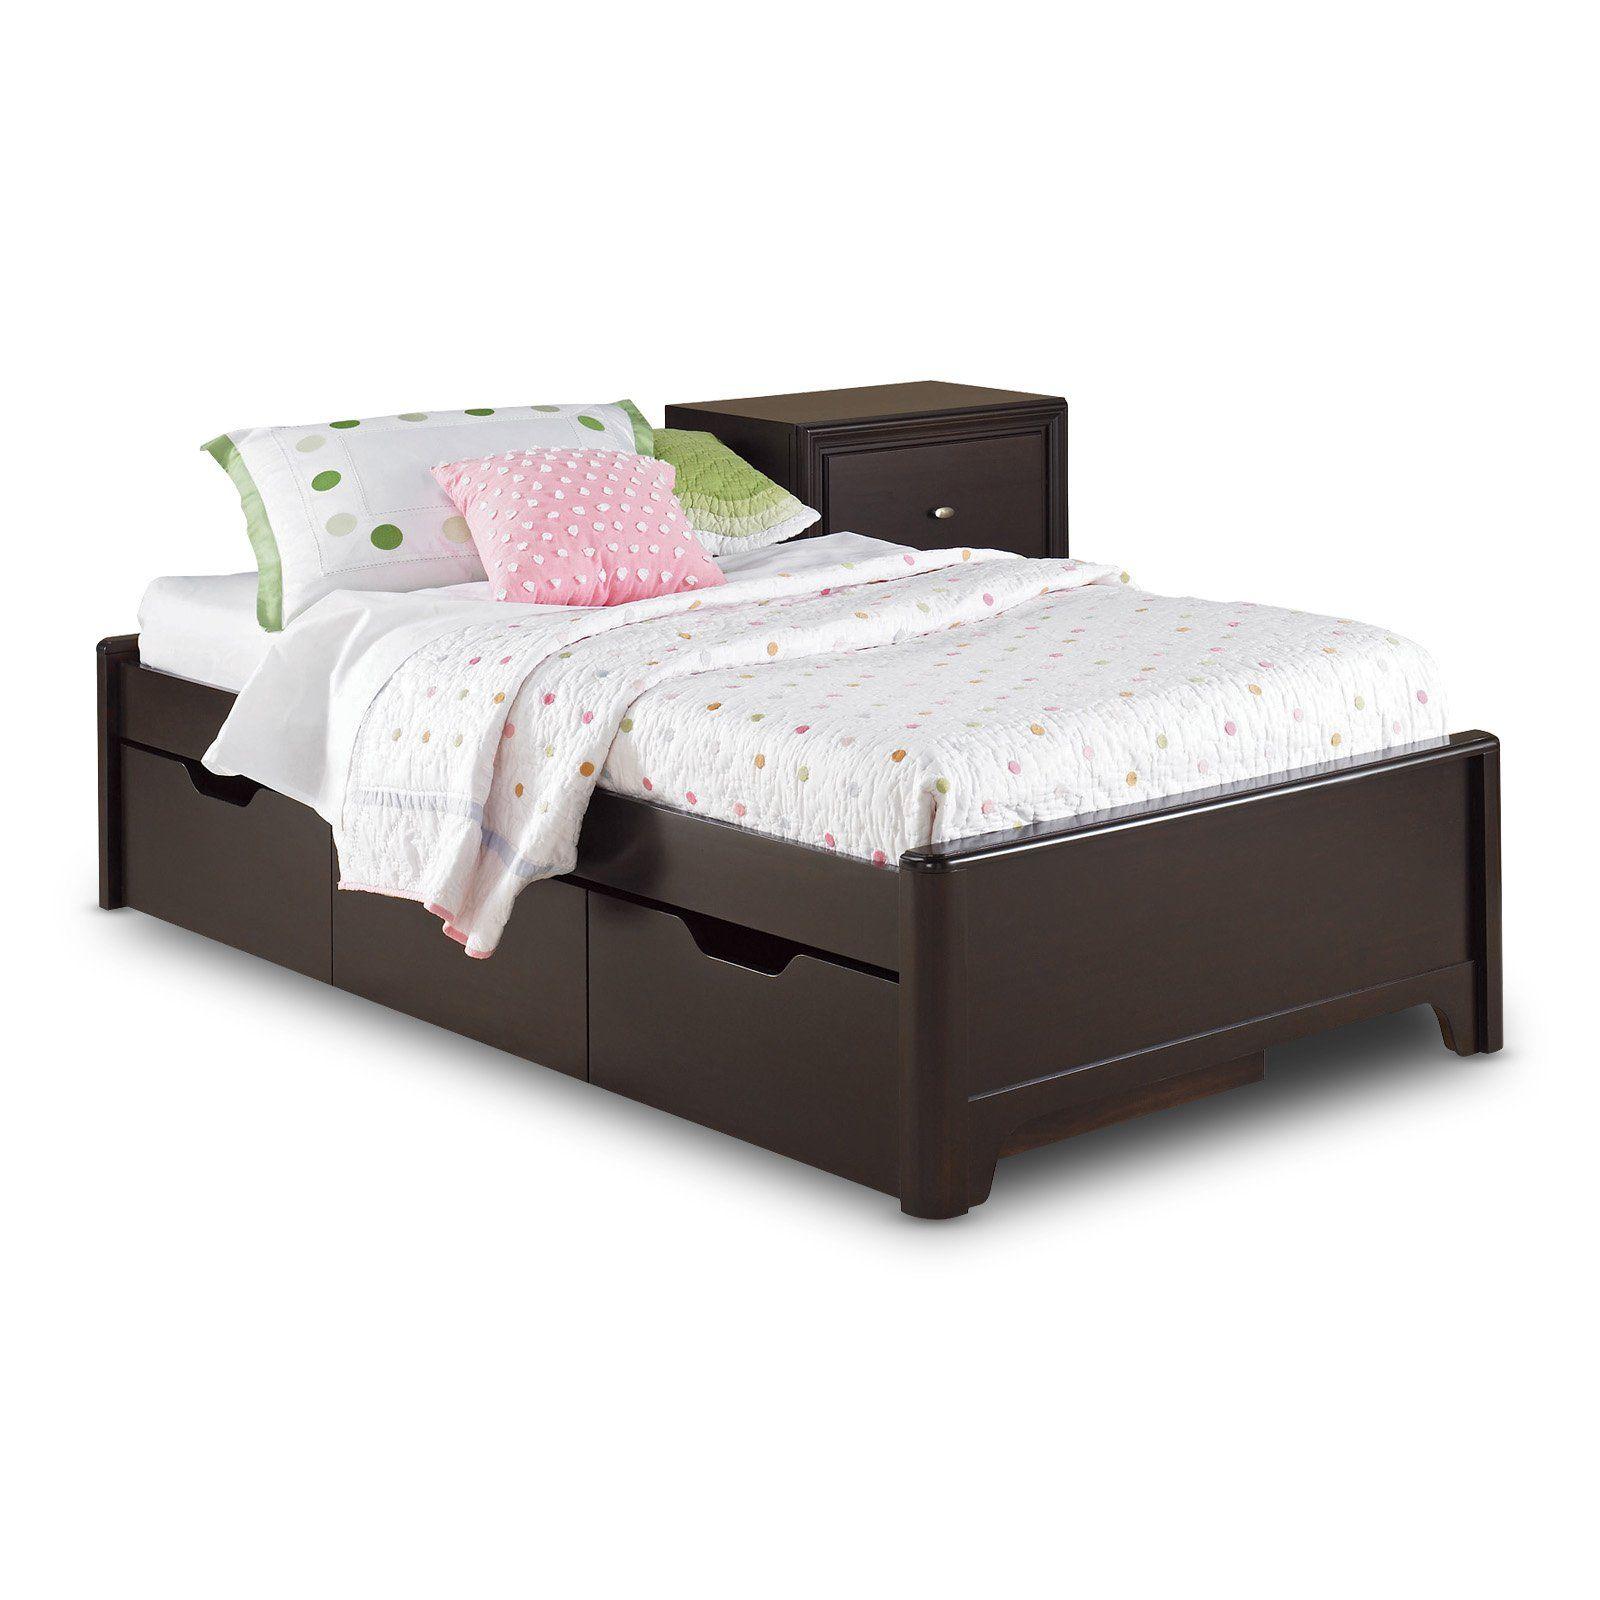 Best Midtown Platform Bed With Storage Drawer Full Shop At 640 x 480